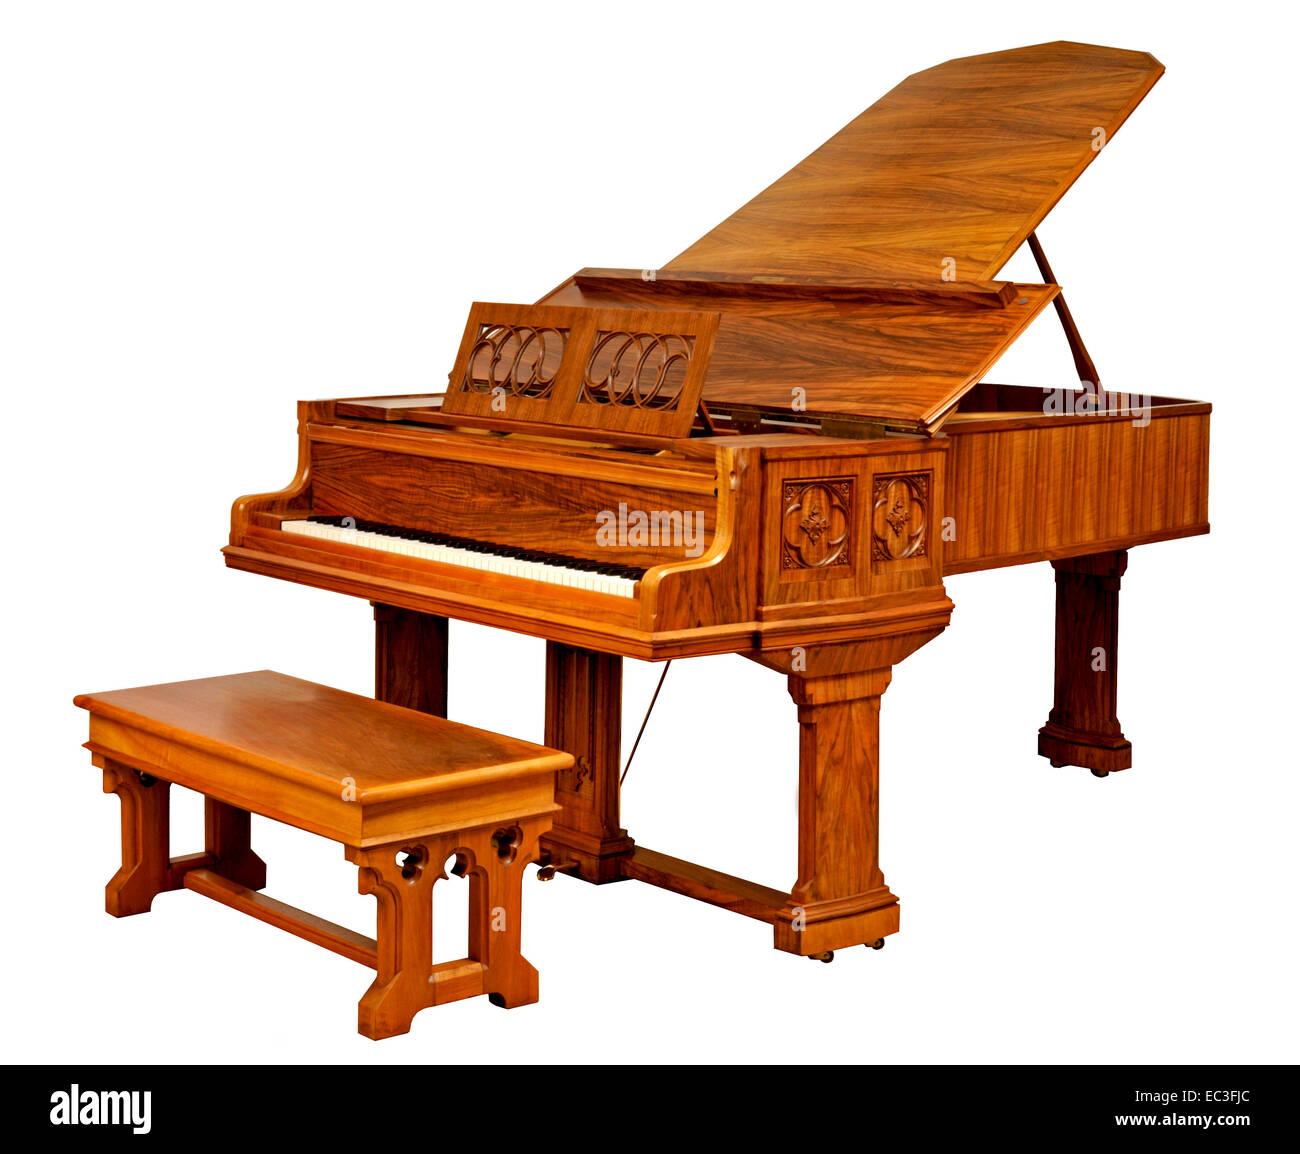 Piano - Stock Image